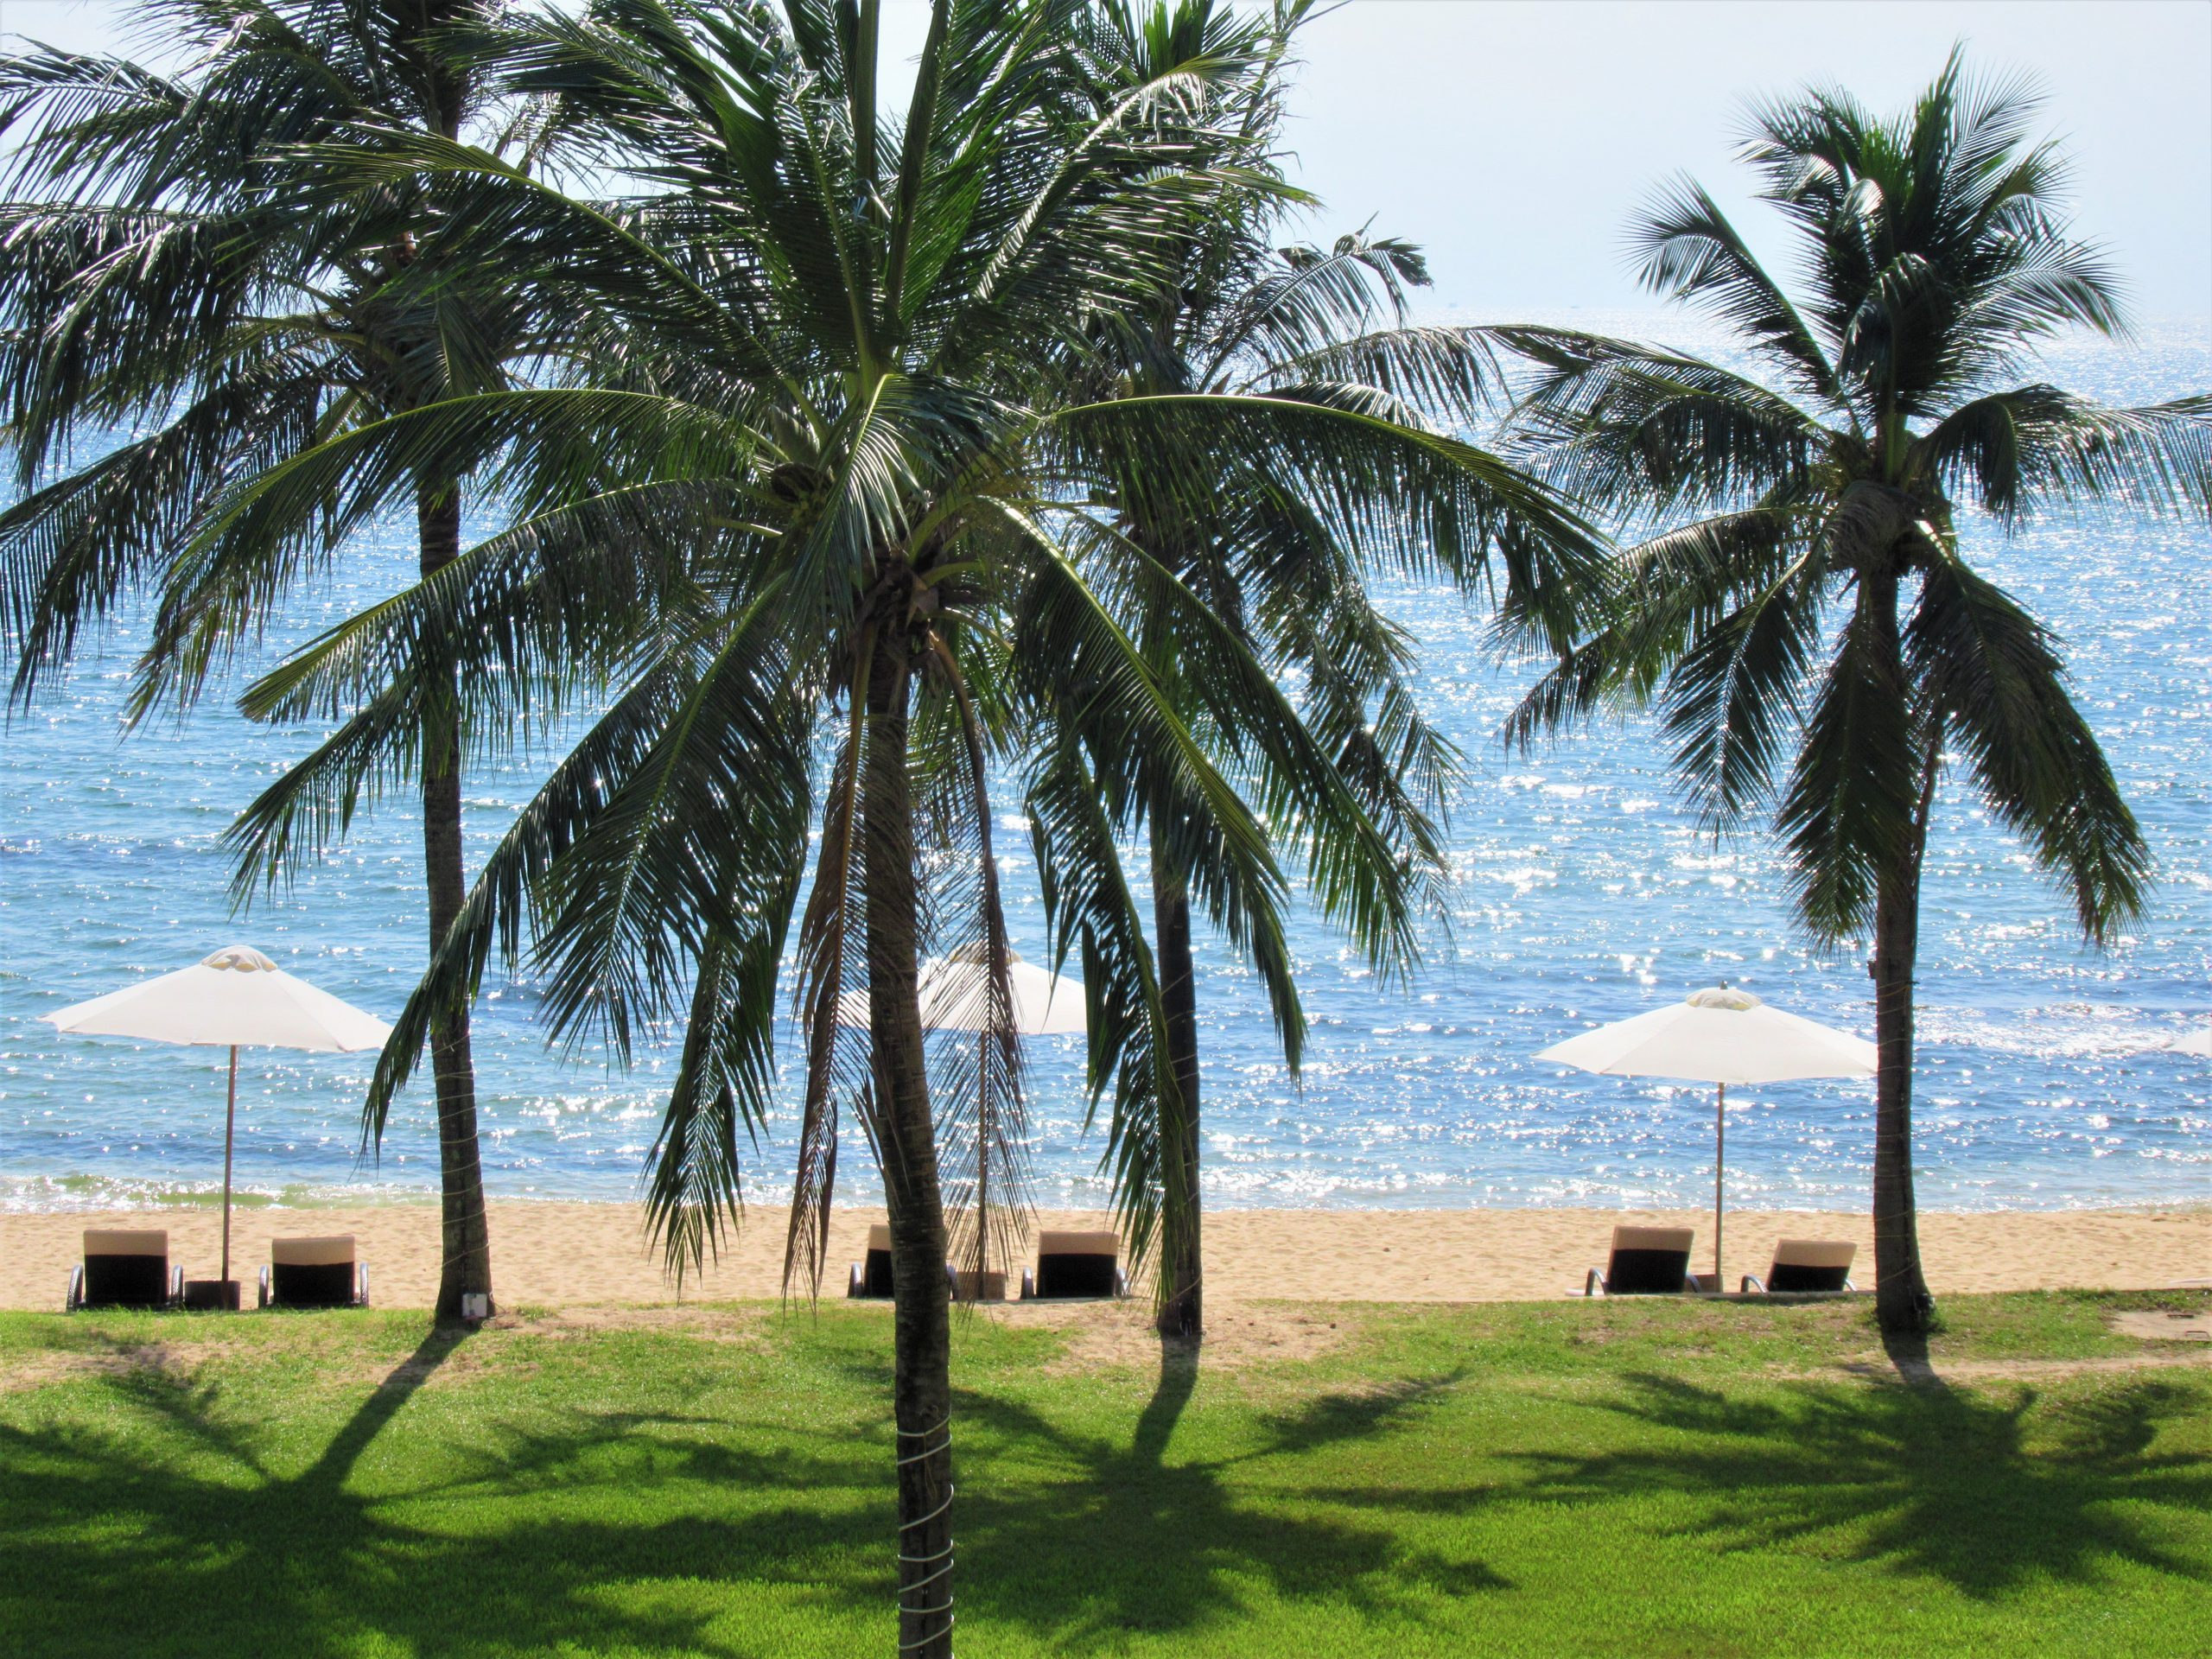 Private beach, The Shells Resort, Phu Quoc Island, Vietnam